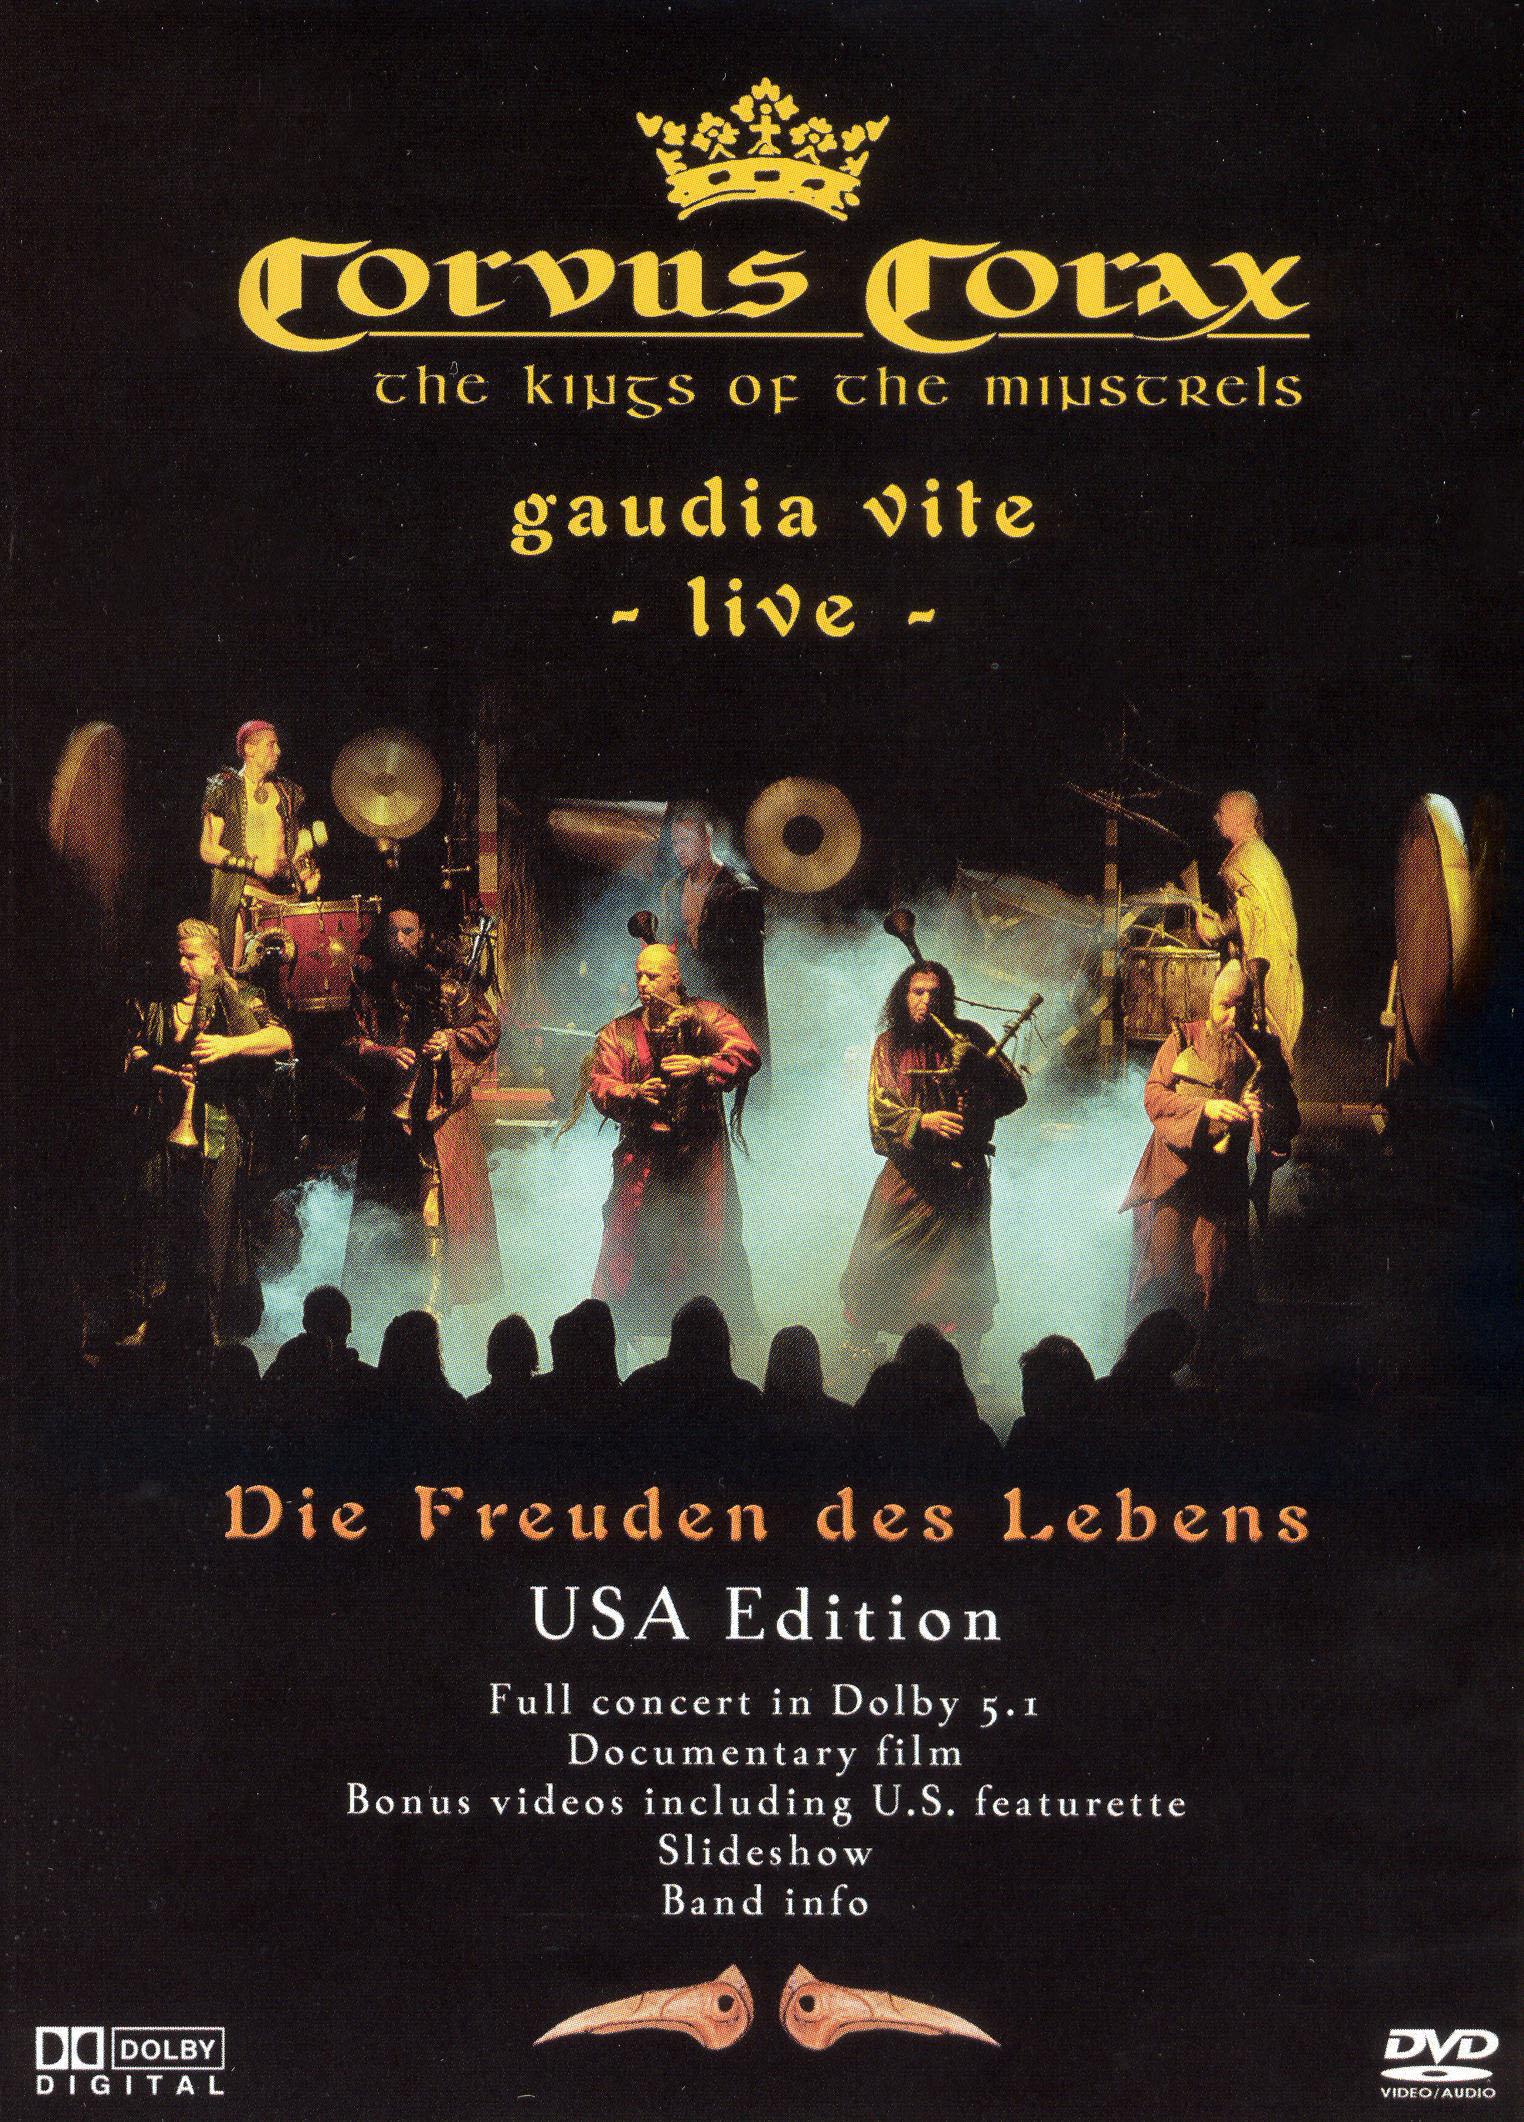 Corvus Corax: Gaudia Vite Live